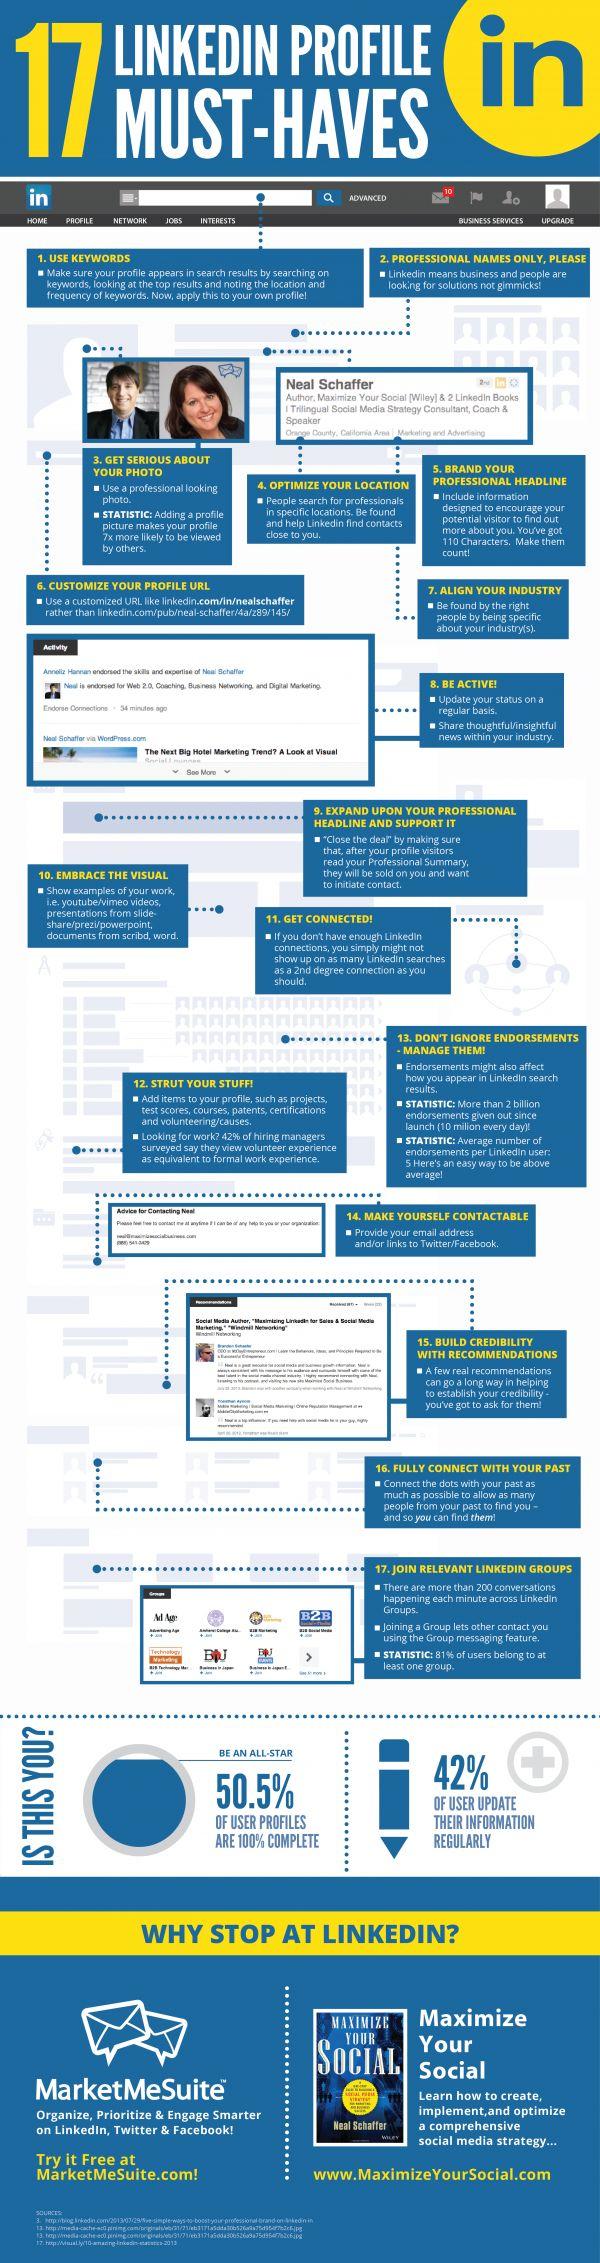 How to Optimize Your LInkedIn Profile #infographic #socialmedia #linkedin #business